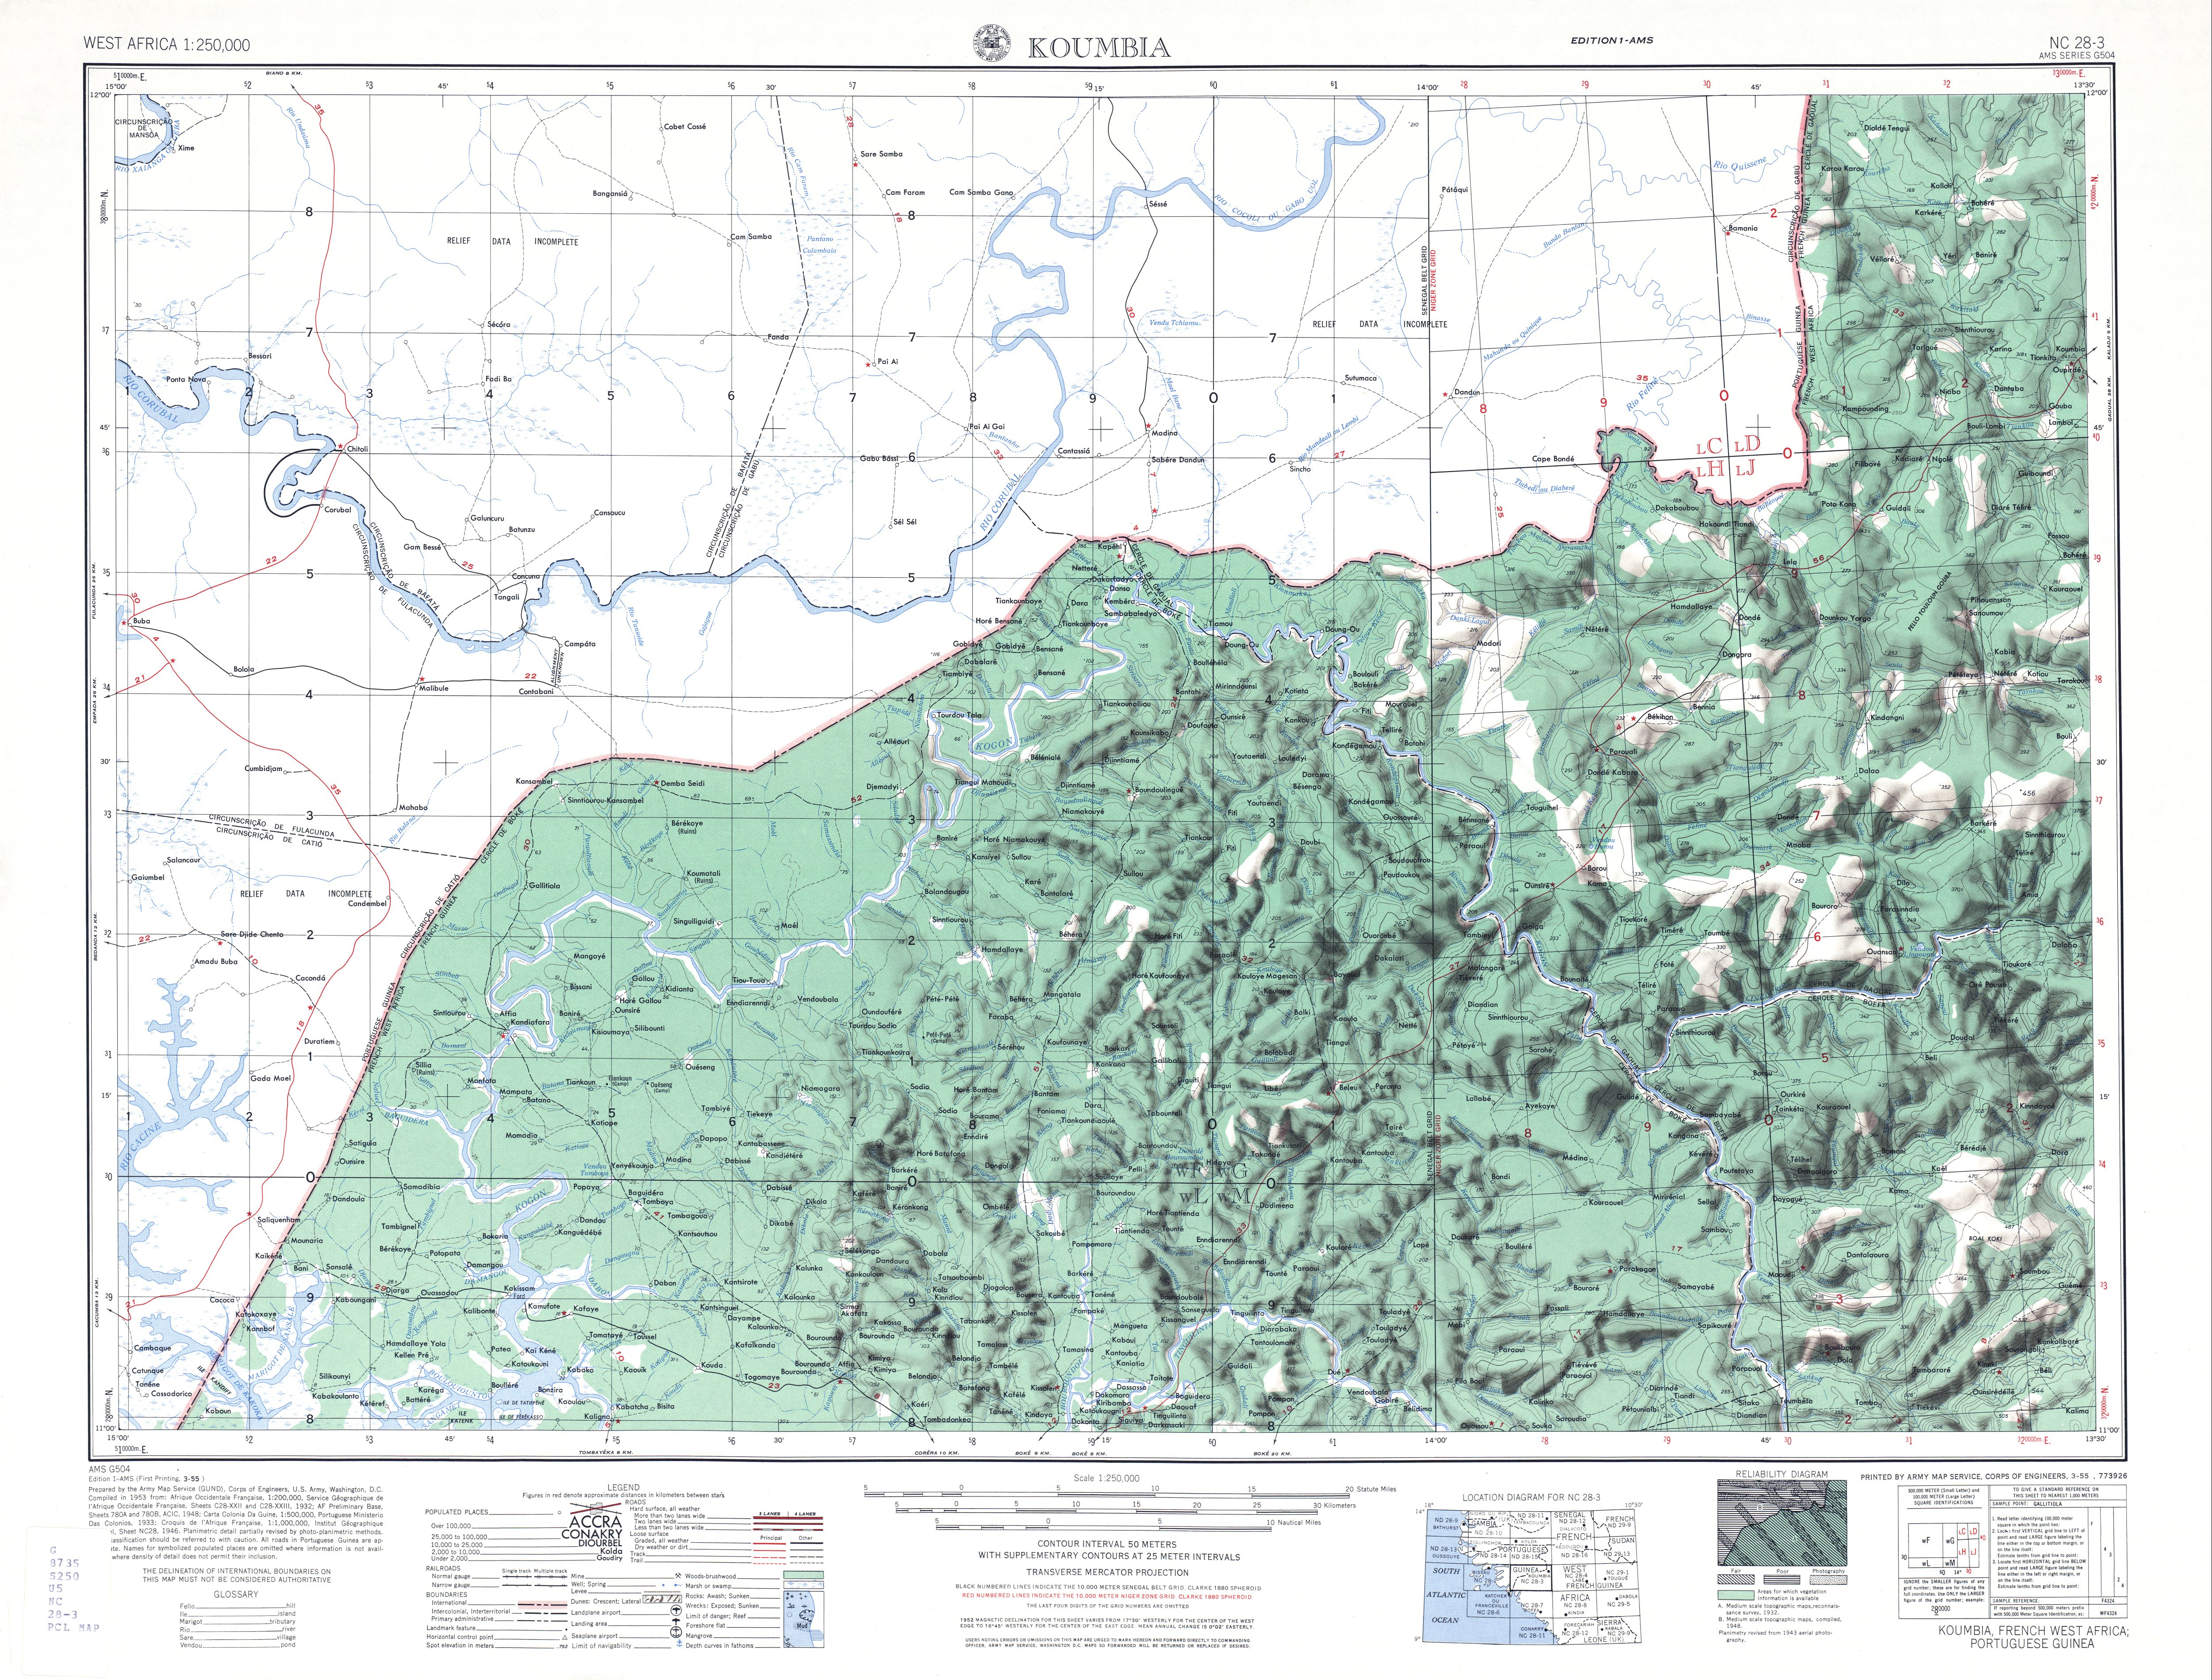 Hoja Koumbia del Mapa Topográfico de África Occidental 1955